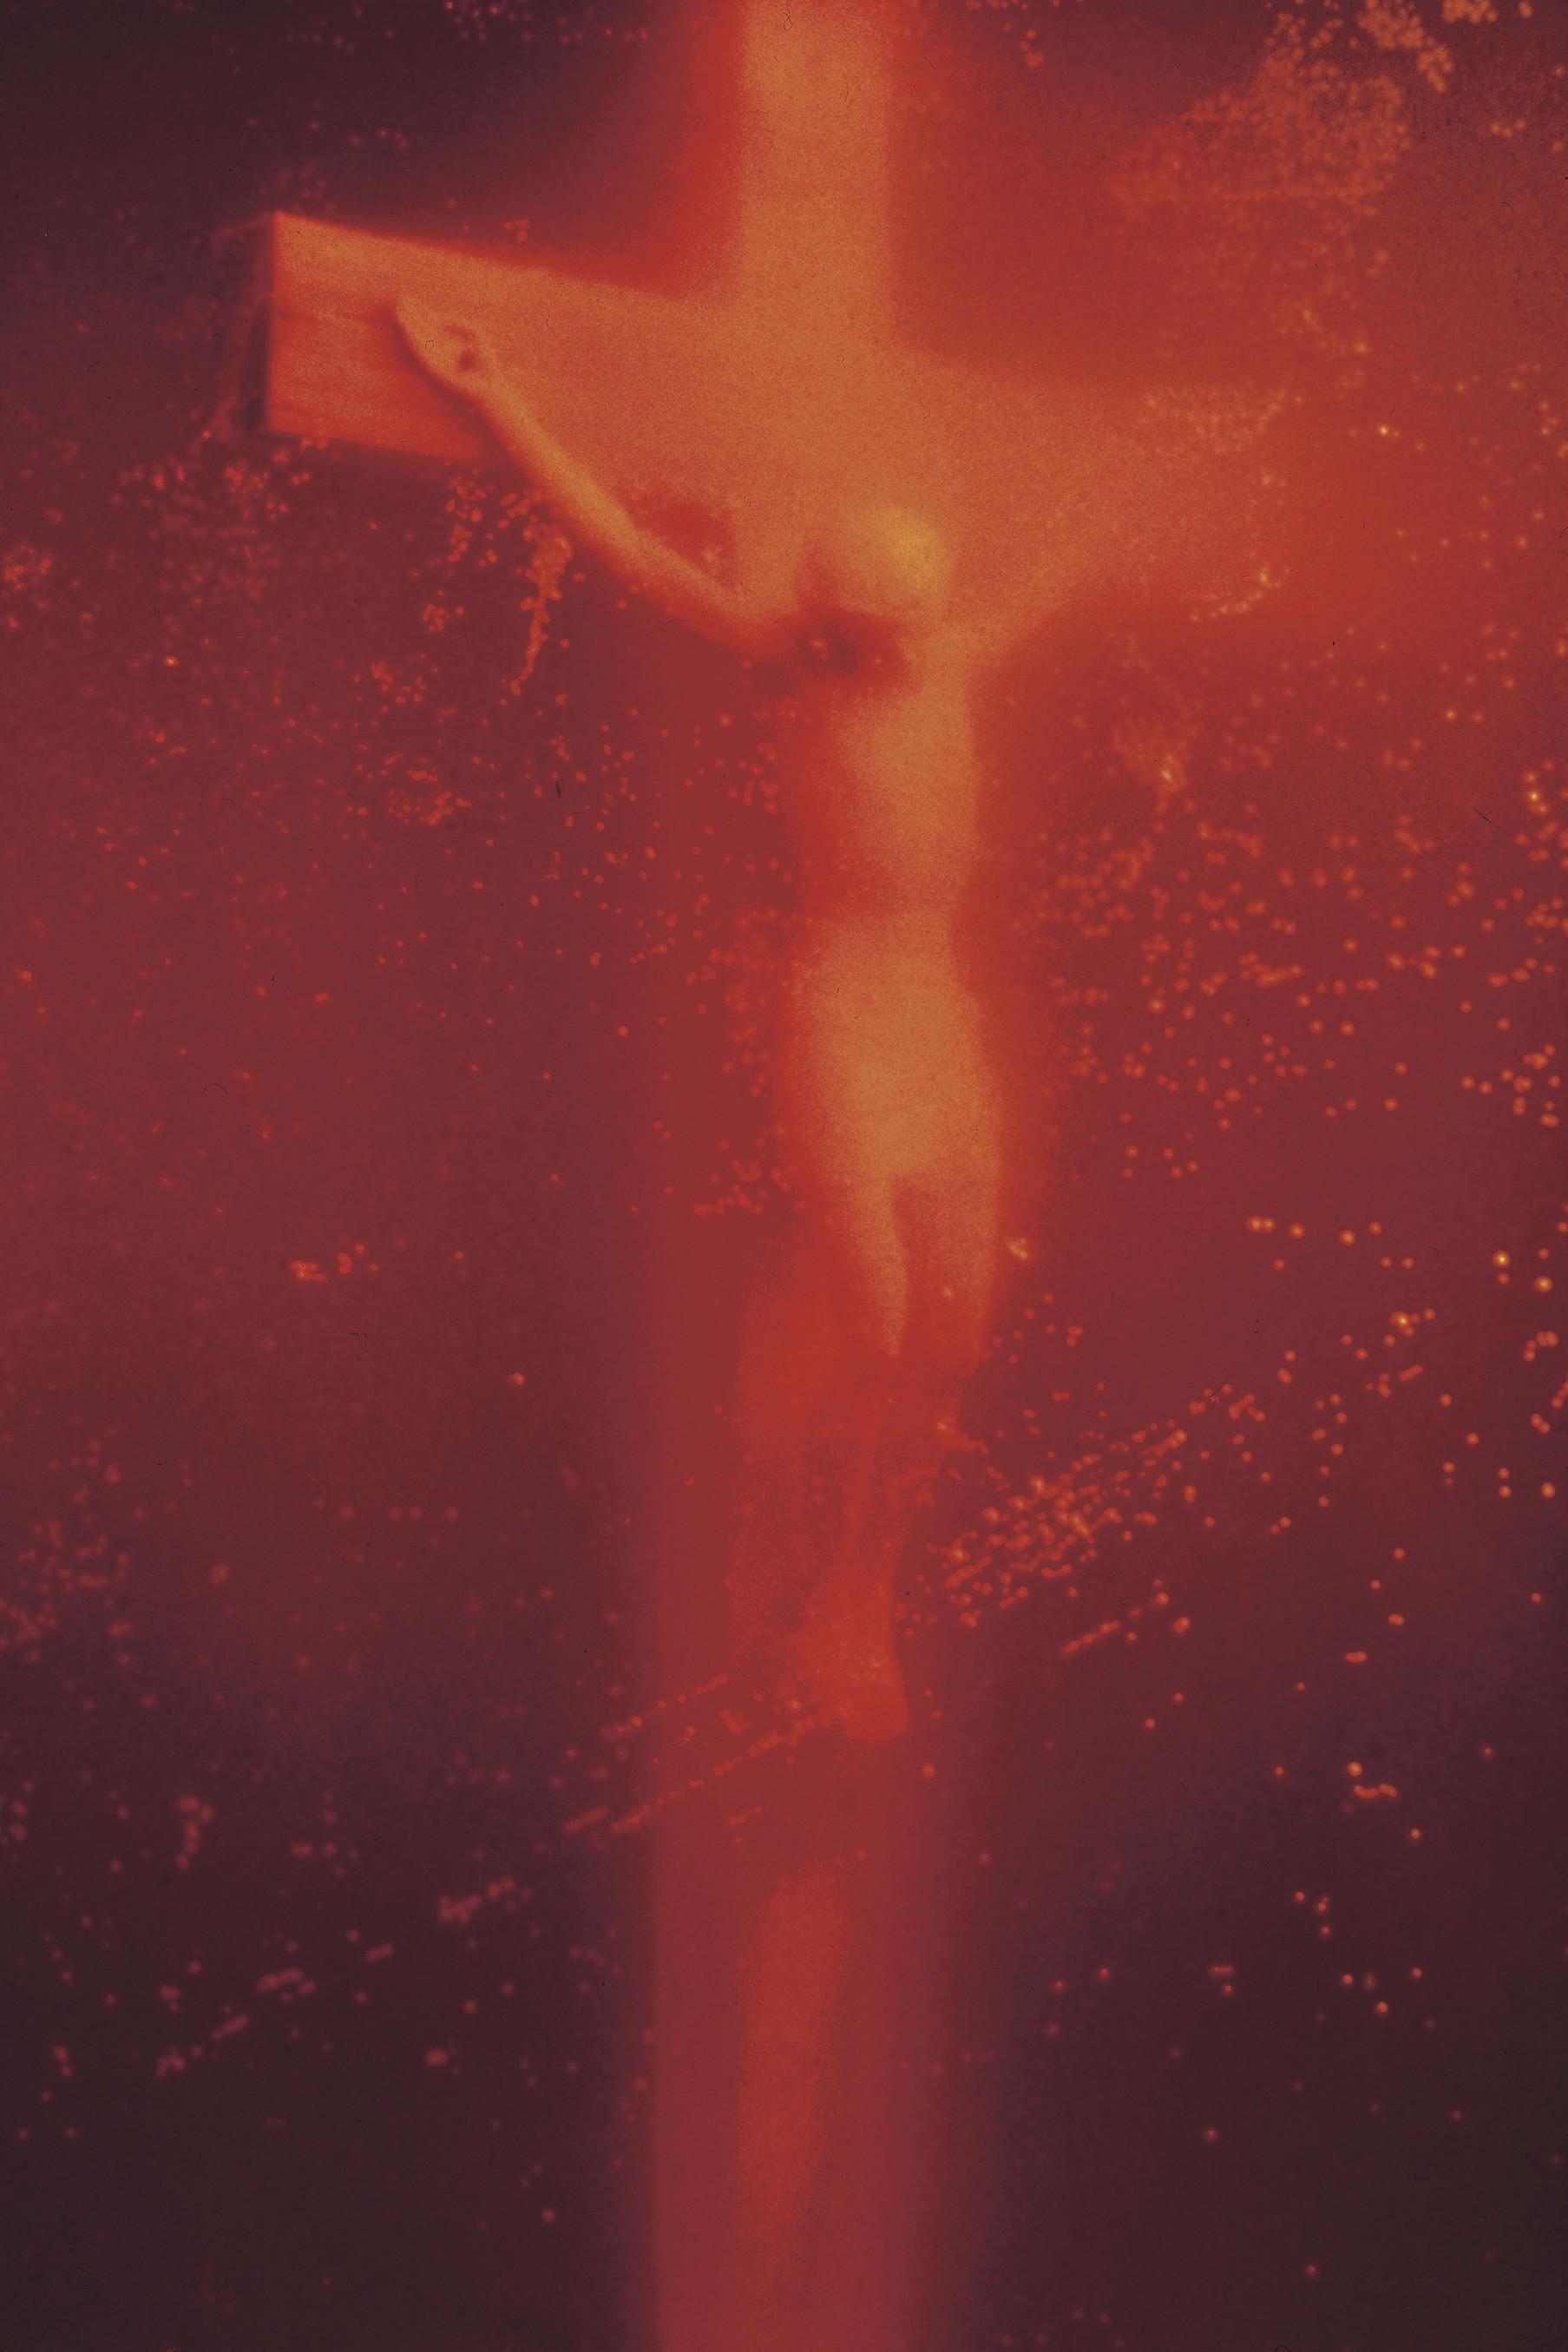 piss-jesus-art-just-iranian-nudee-girls